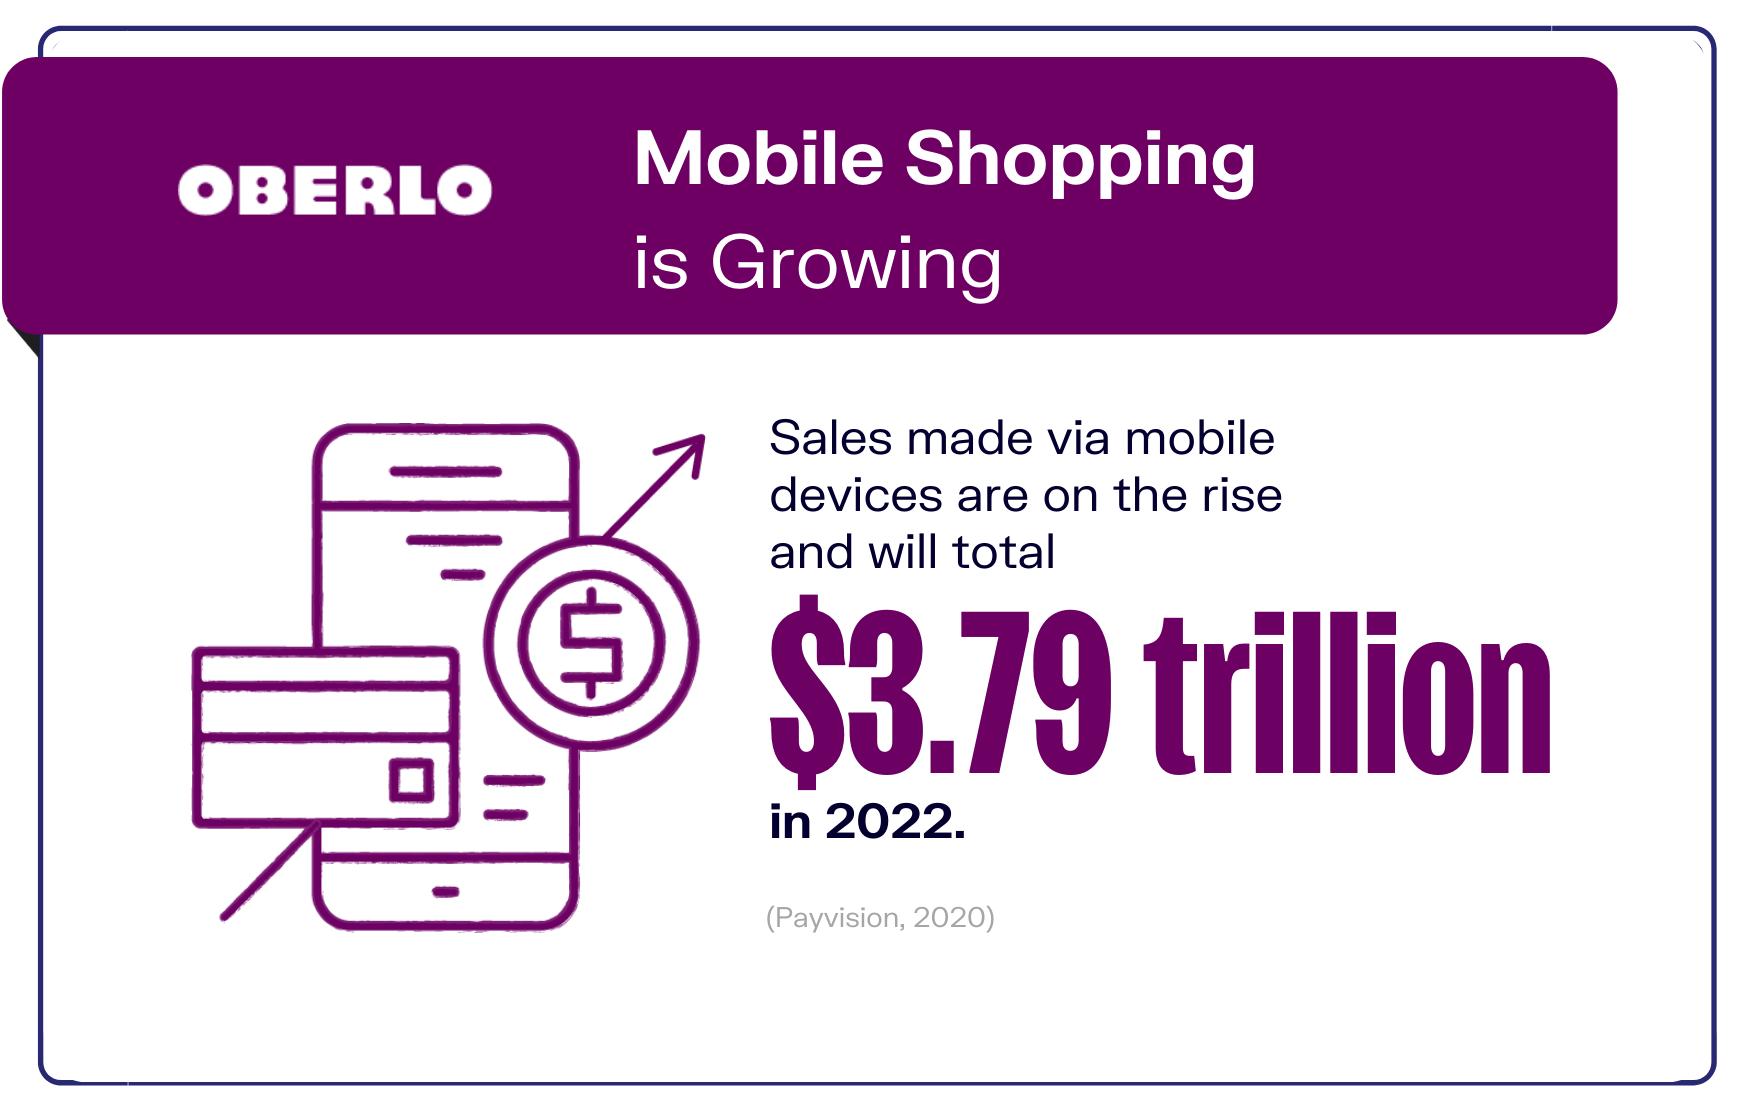 2021de-bilmeniz-gereken-e-ticaret-trendleri